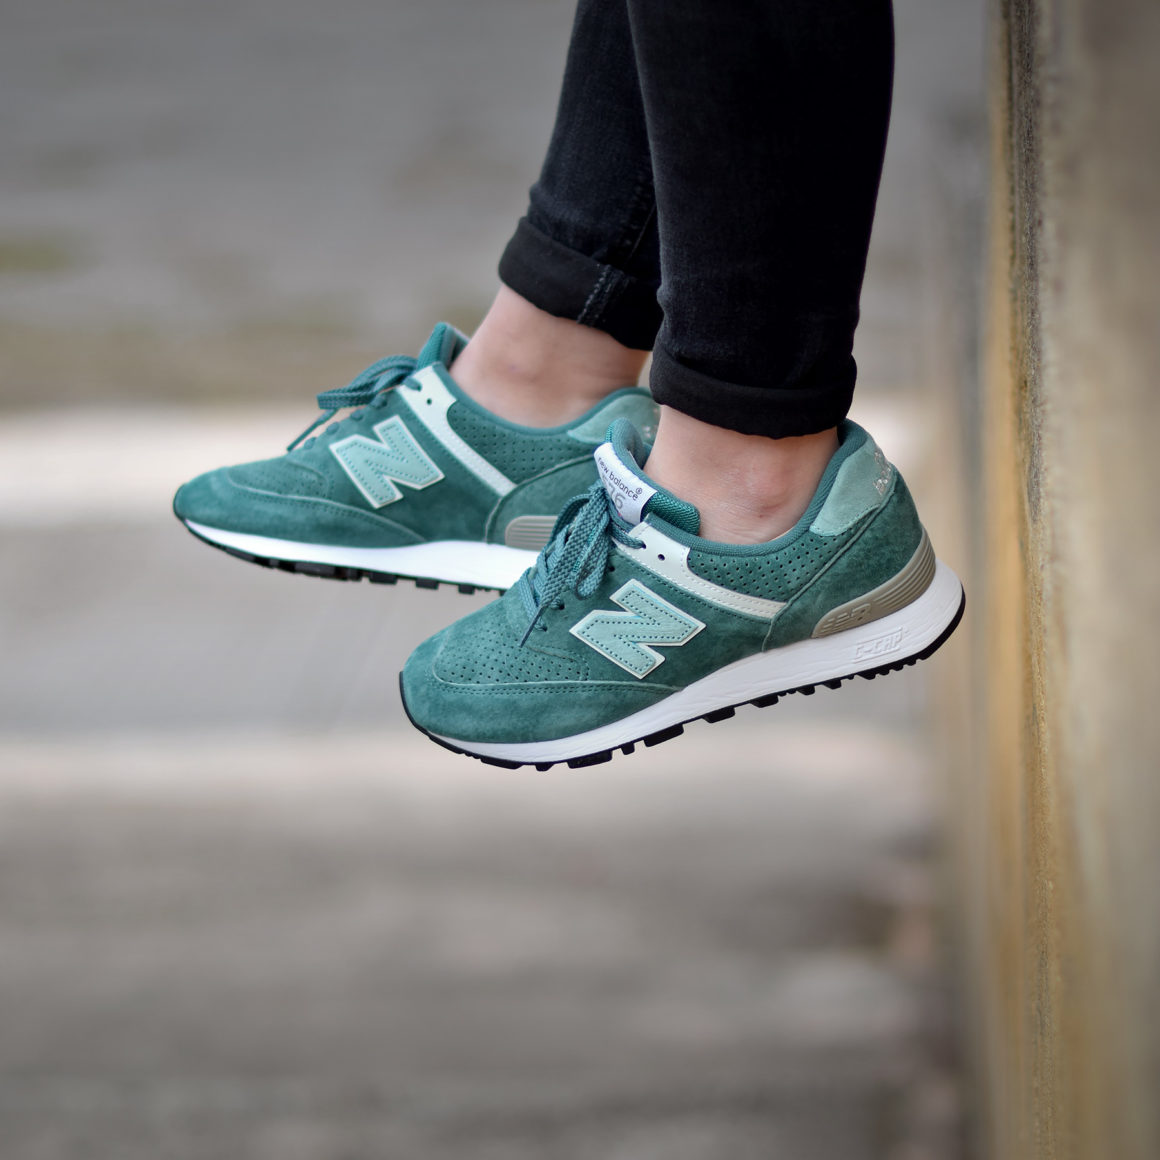 New Balance W 576 PMM Vert - Sneakers.fr